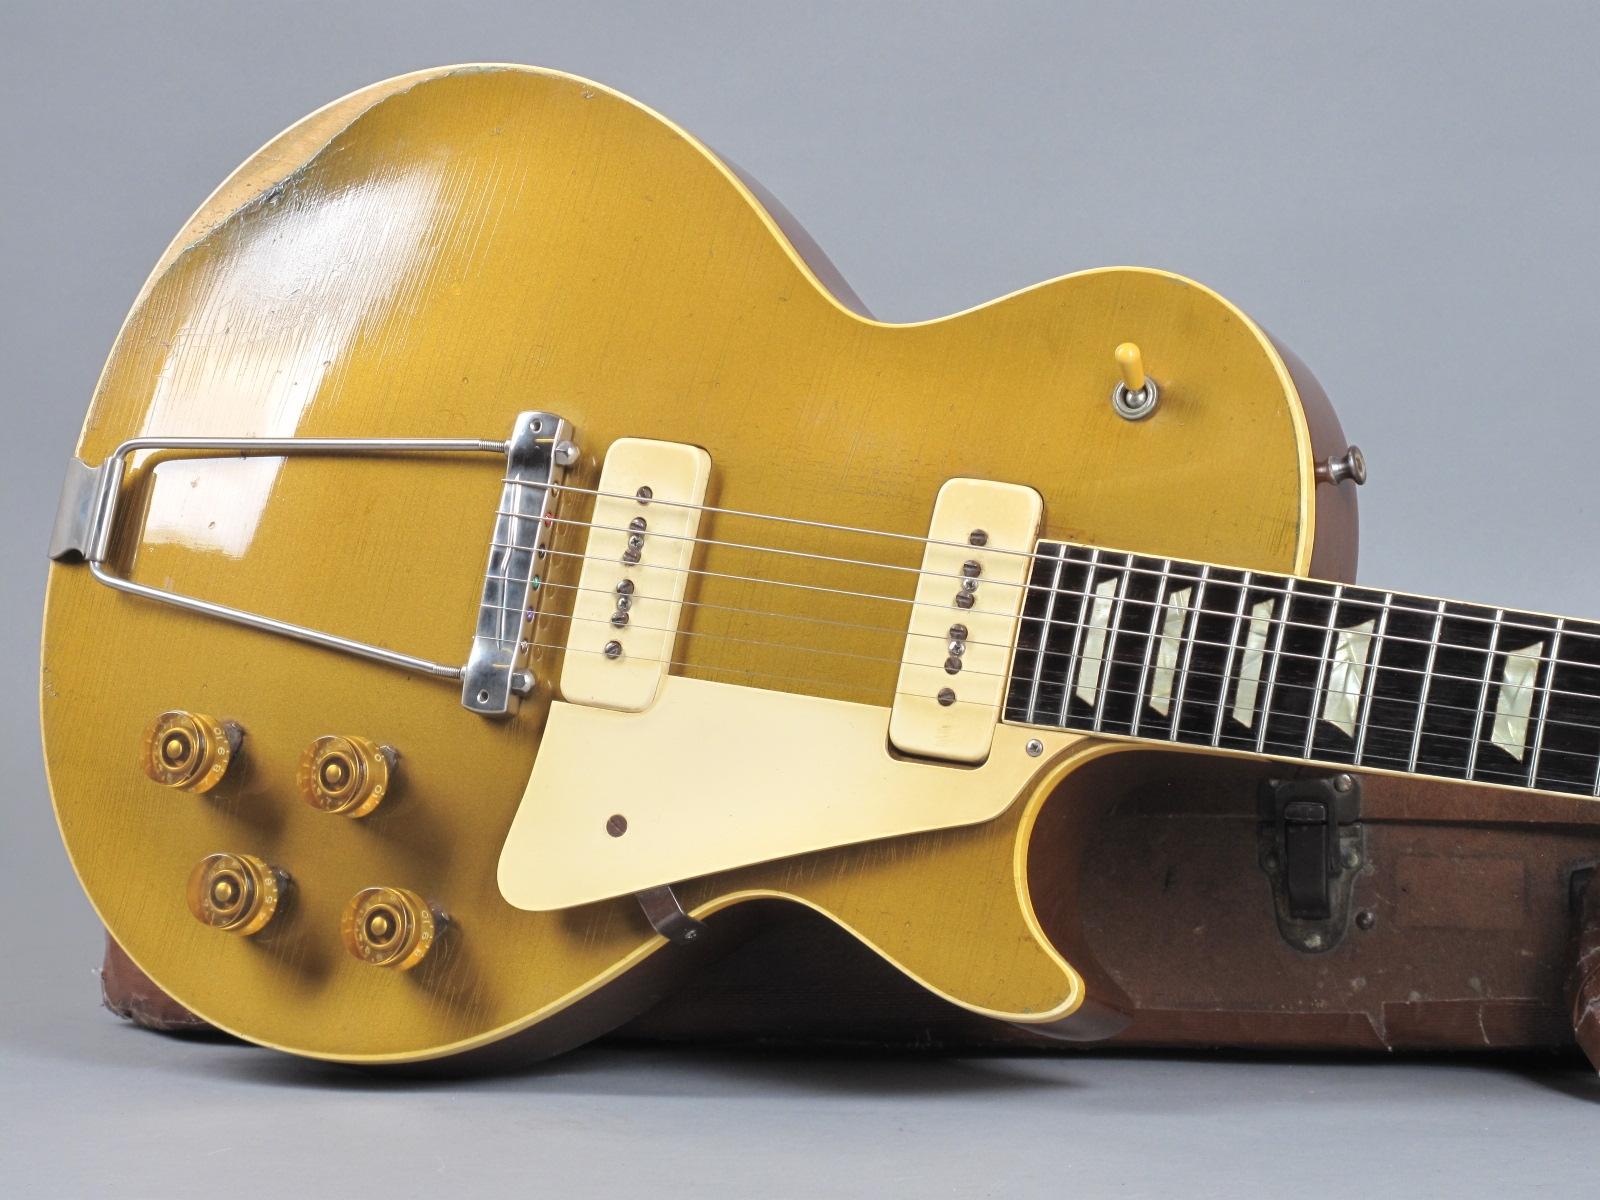 https://guitarpoint.de/app/uploads/products/1952-gibson-les-paul-goldtop-3/1952-Gibson-Les-Paul-Standard-Goldtop-1911-19.jpg